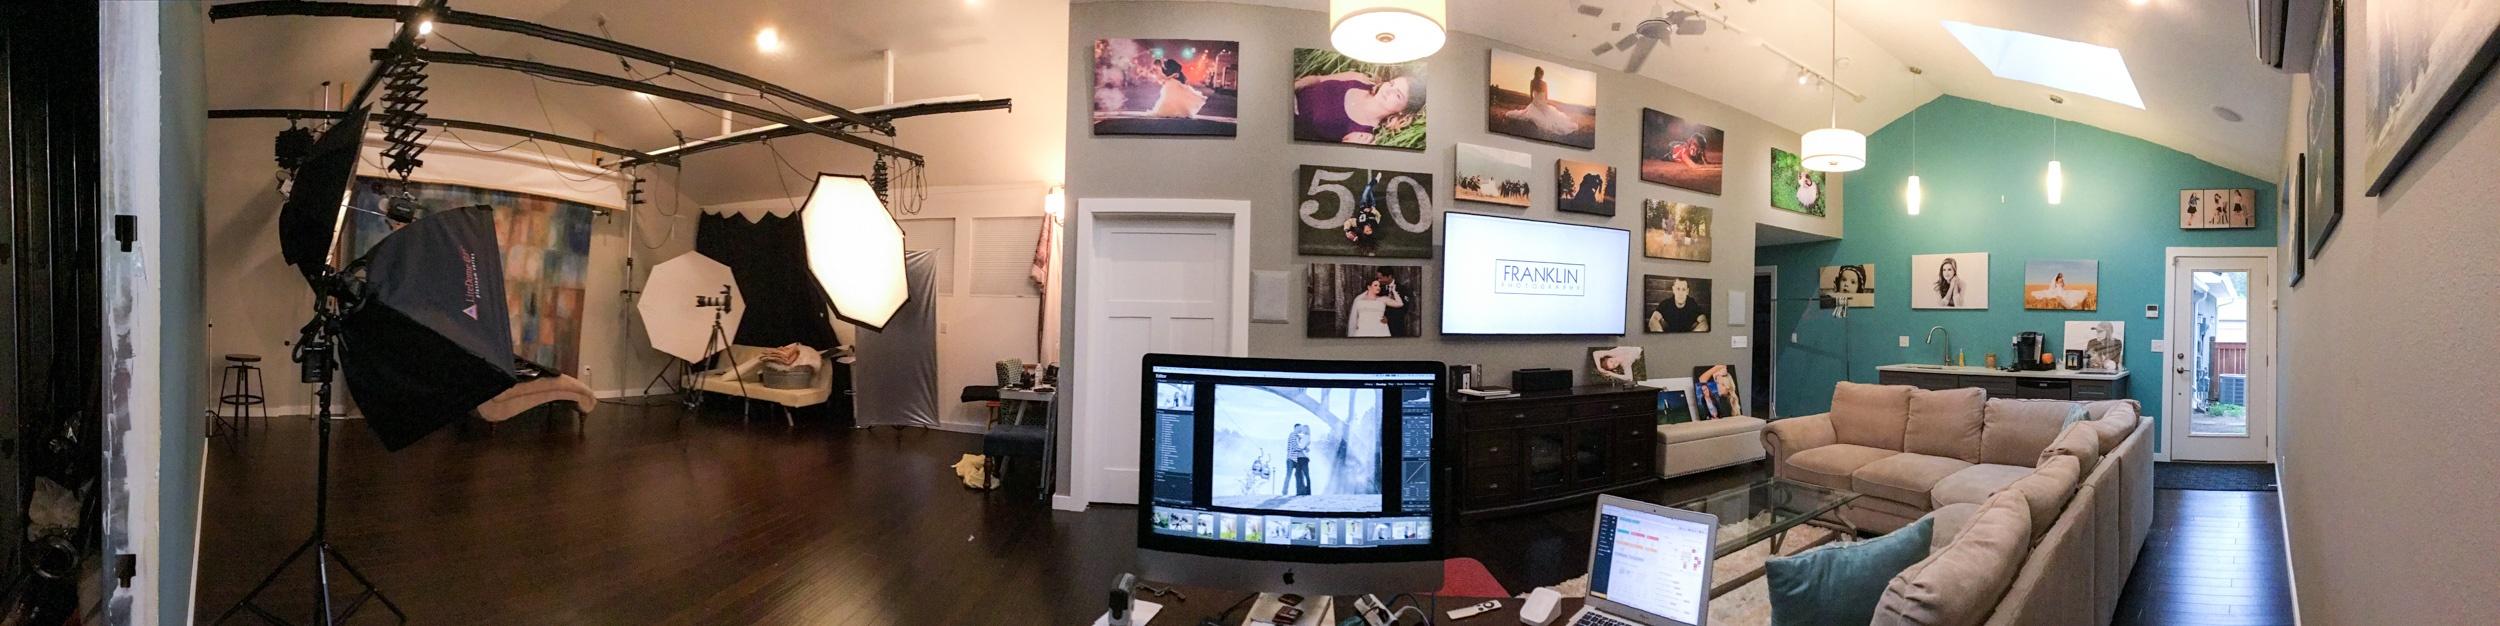 Franklin Photography Studio